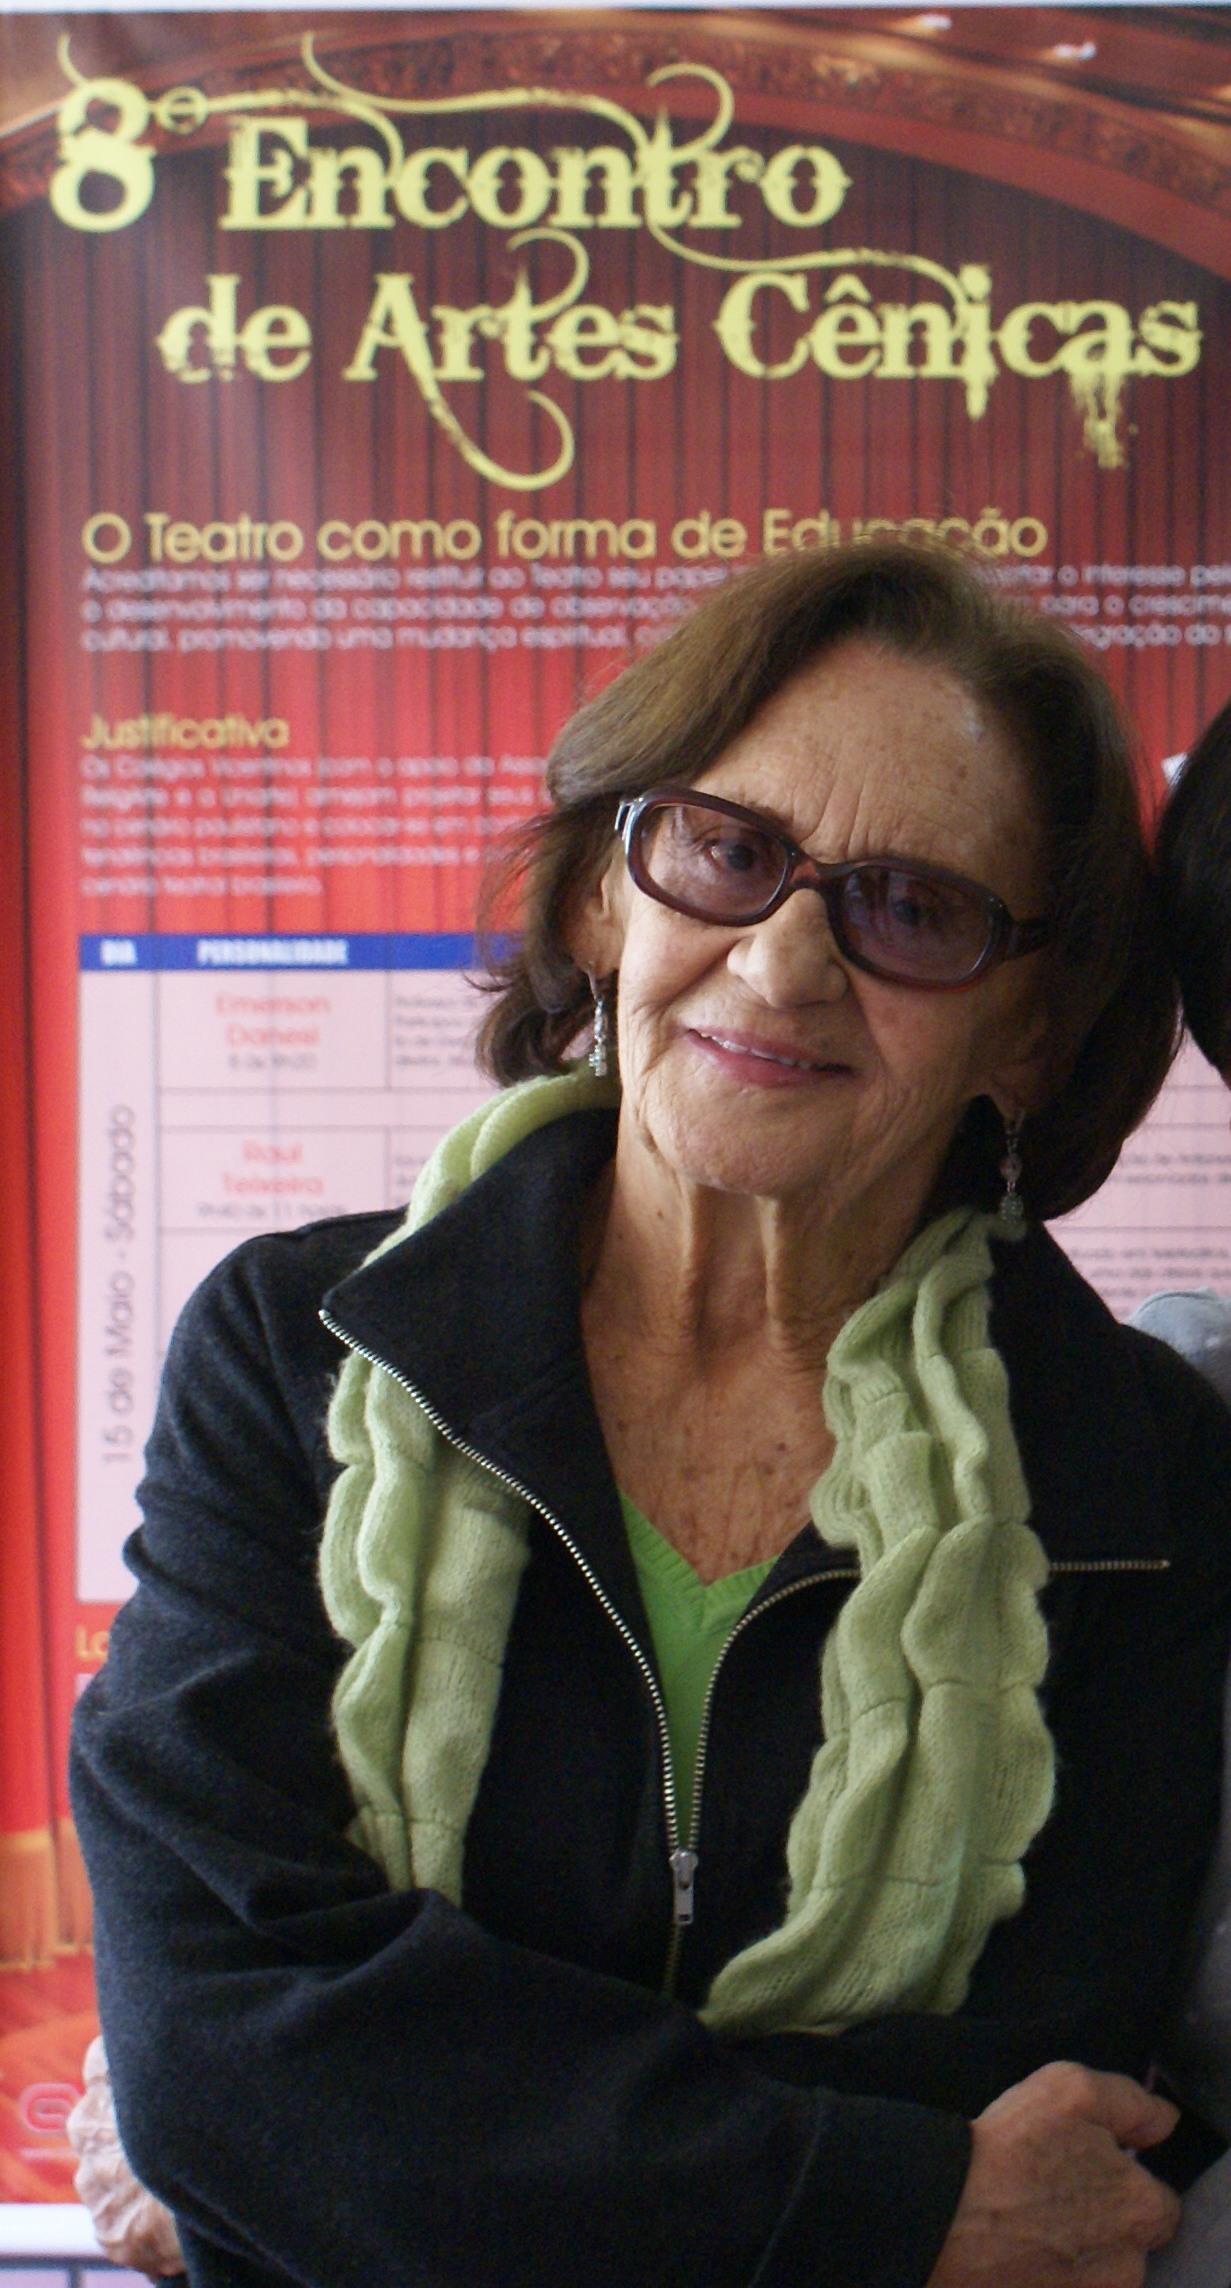 http://upload.wikimedia.org/wikipedia/commons/e/ee/Laura_Cardoso_-_2010.jpg